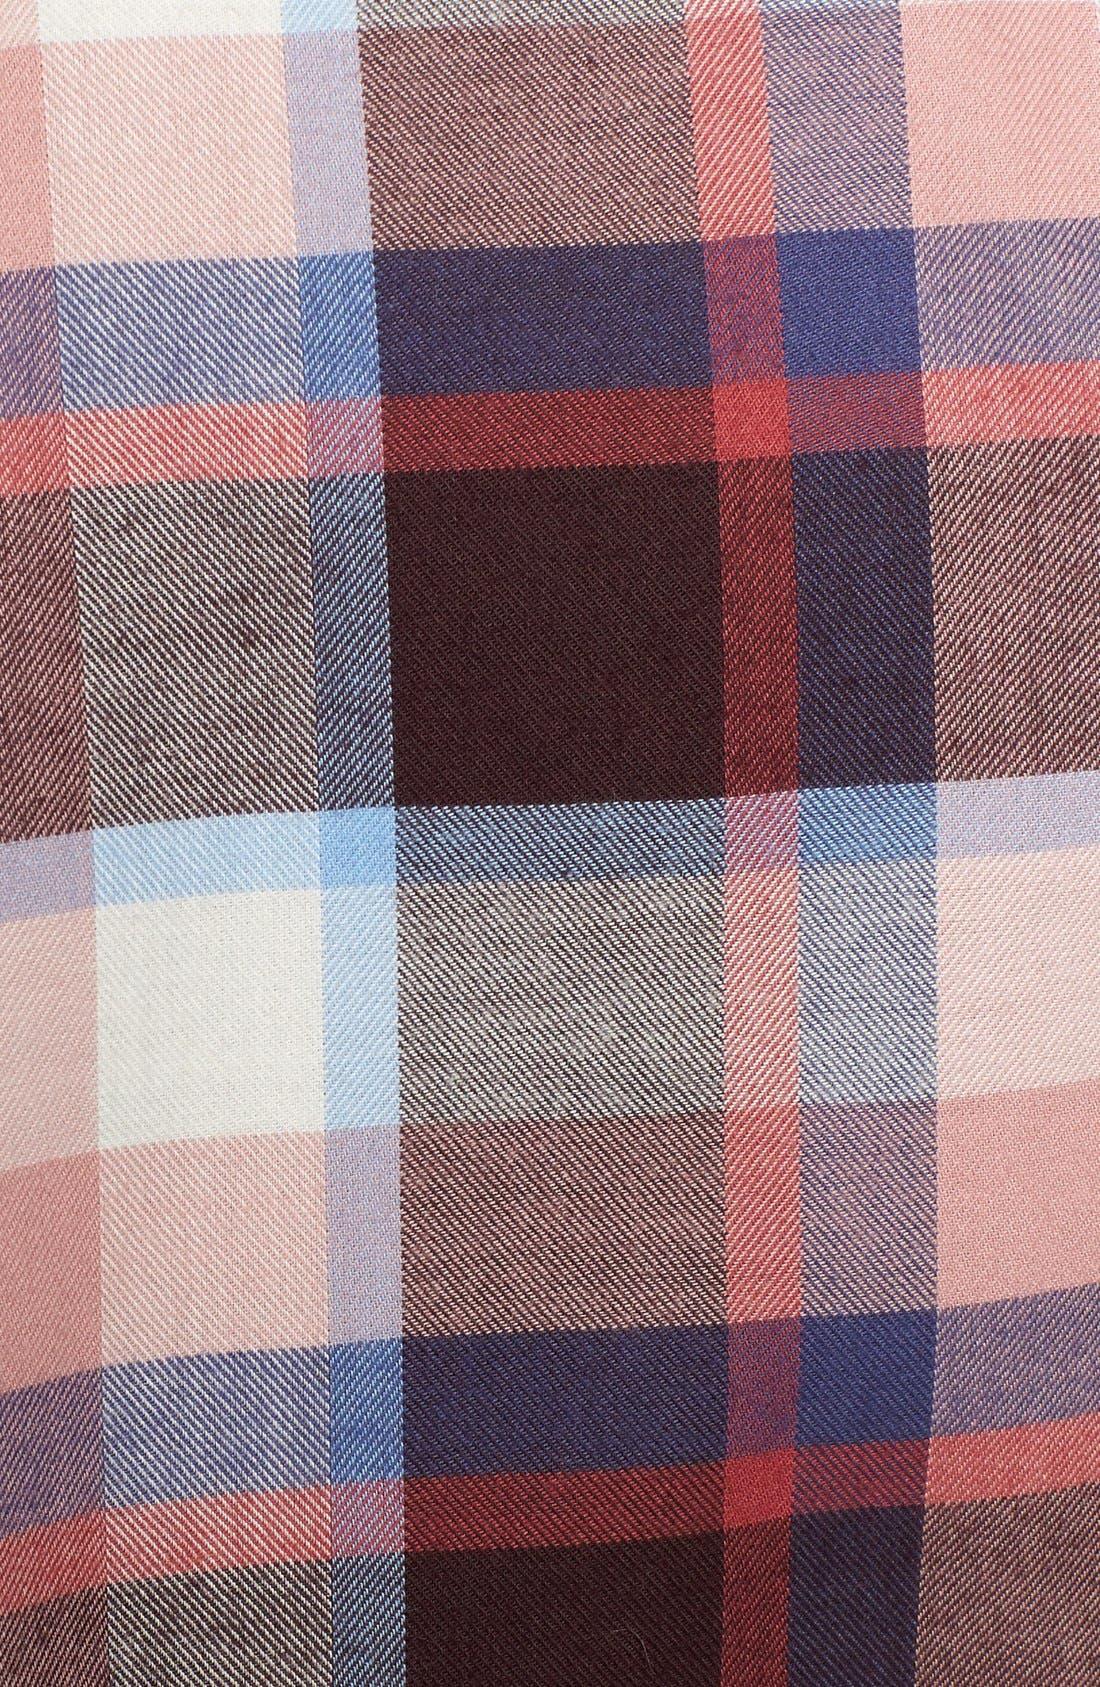 'Darwen' Plaid Shirt,                             Alternate thumbnail 5, color,                             Pink Check